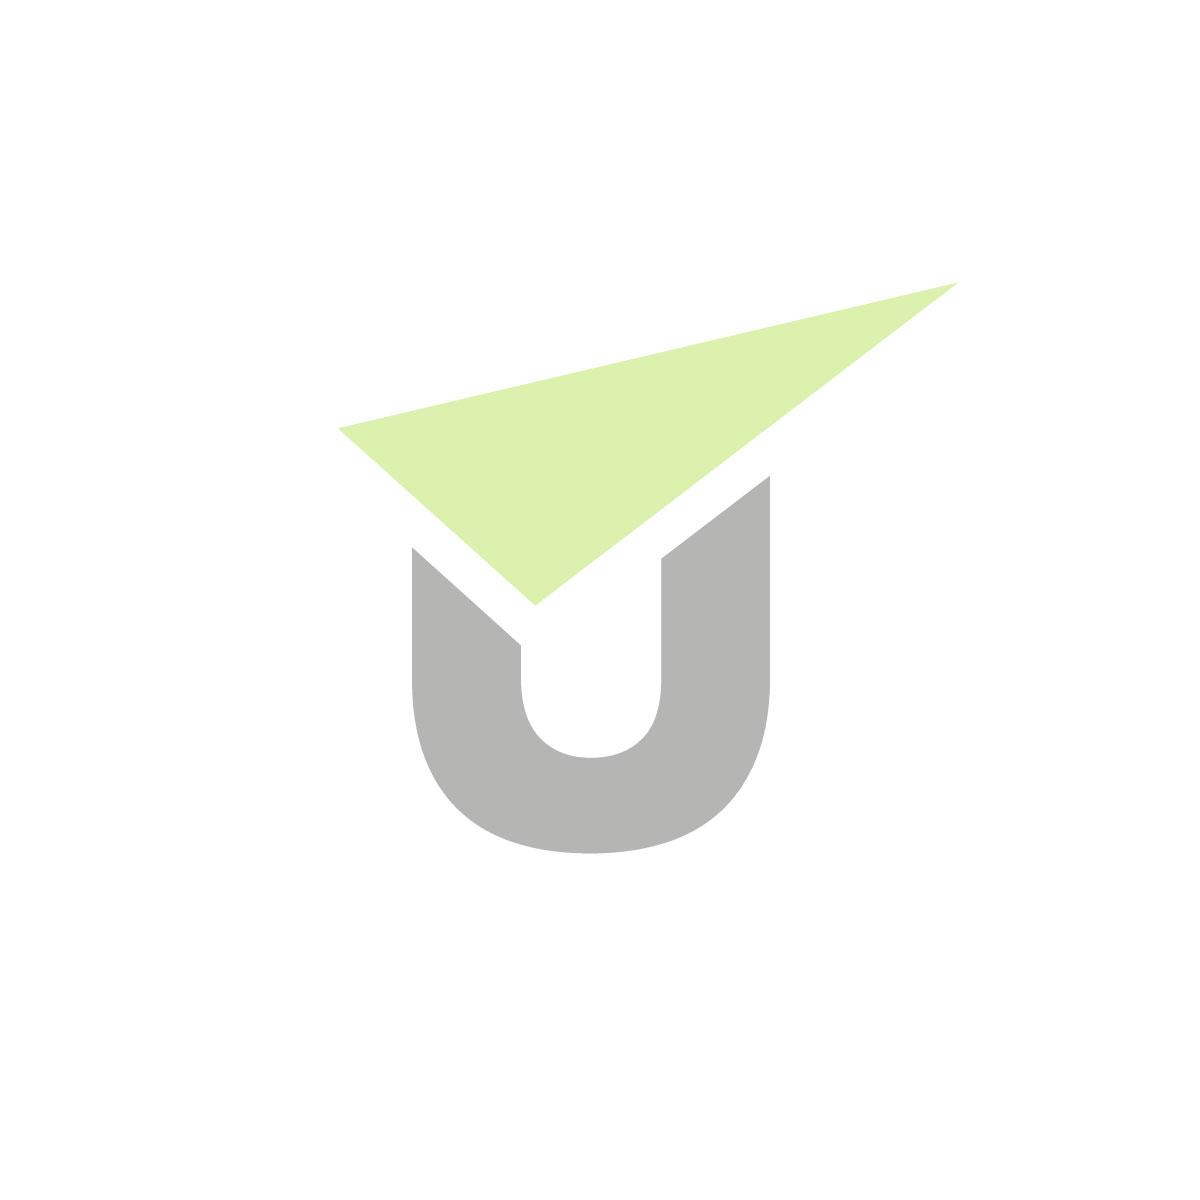 Tabla paddle surf hinchable OAHU como producto recomendado